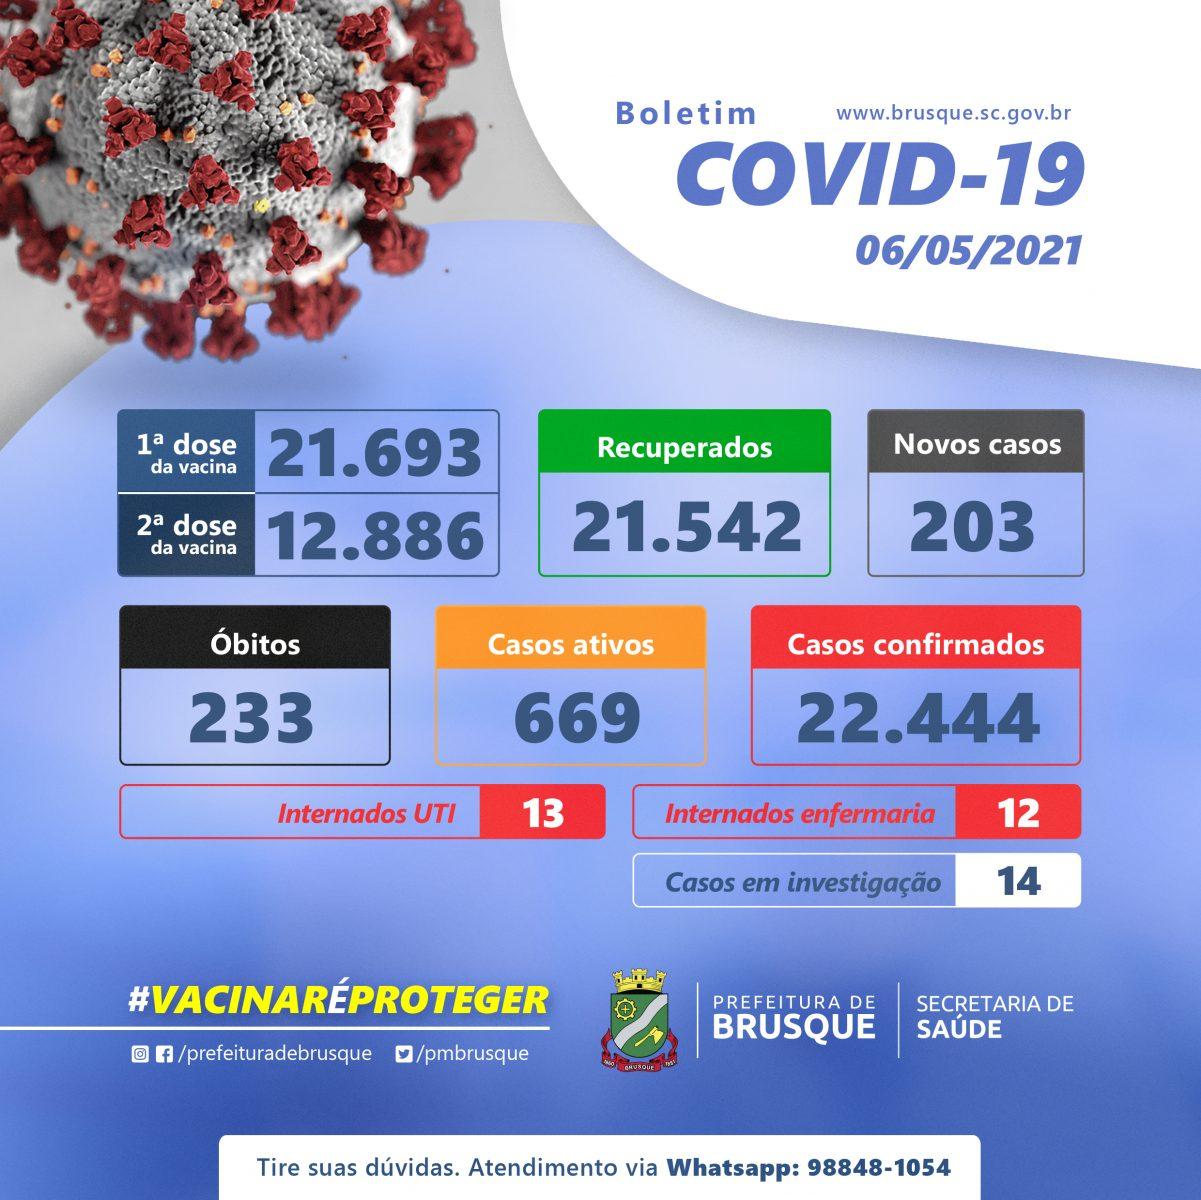 Covid 19: Confira o boletim epidemiológico desta quinta-feira (06)